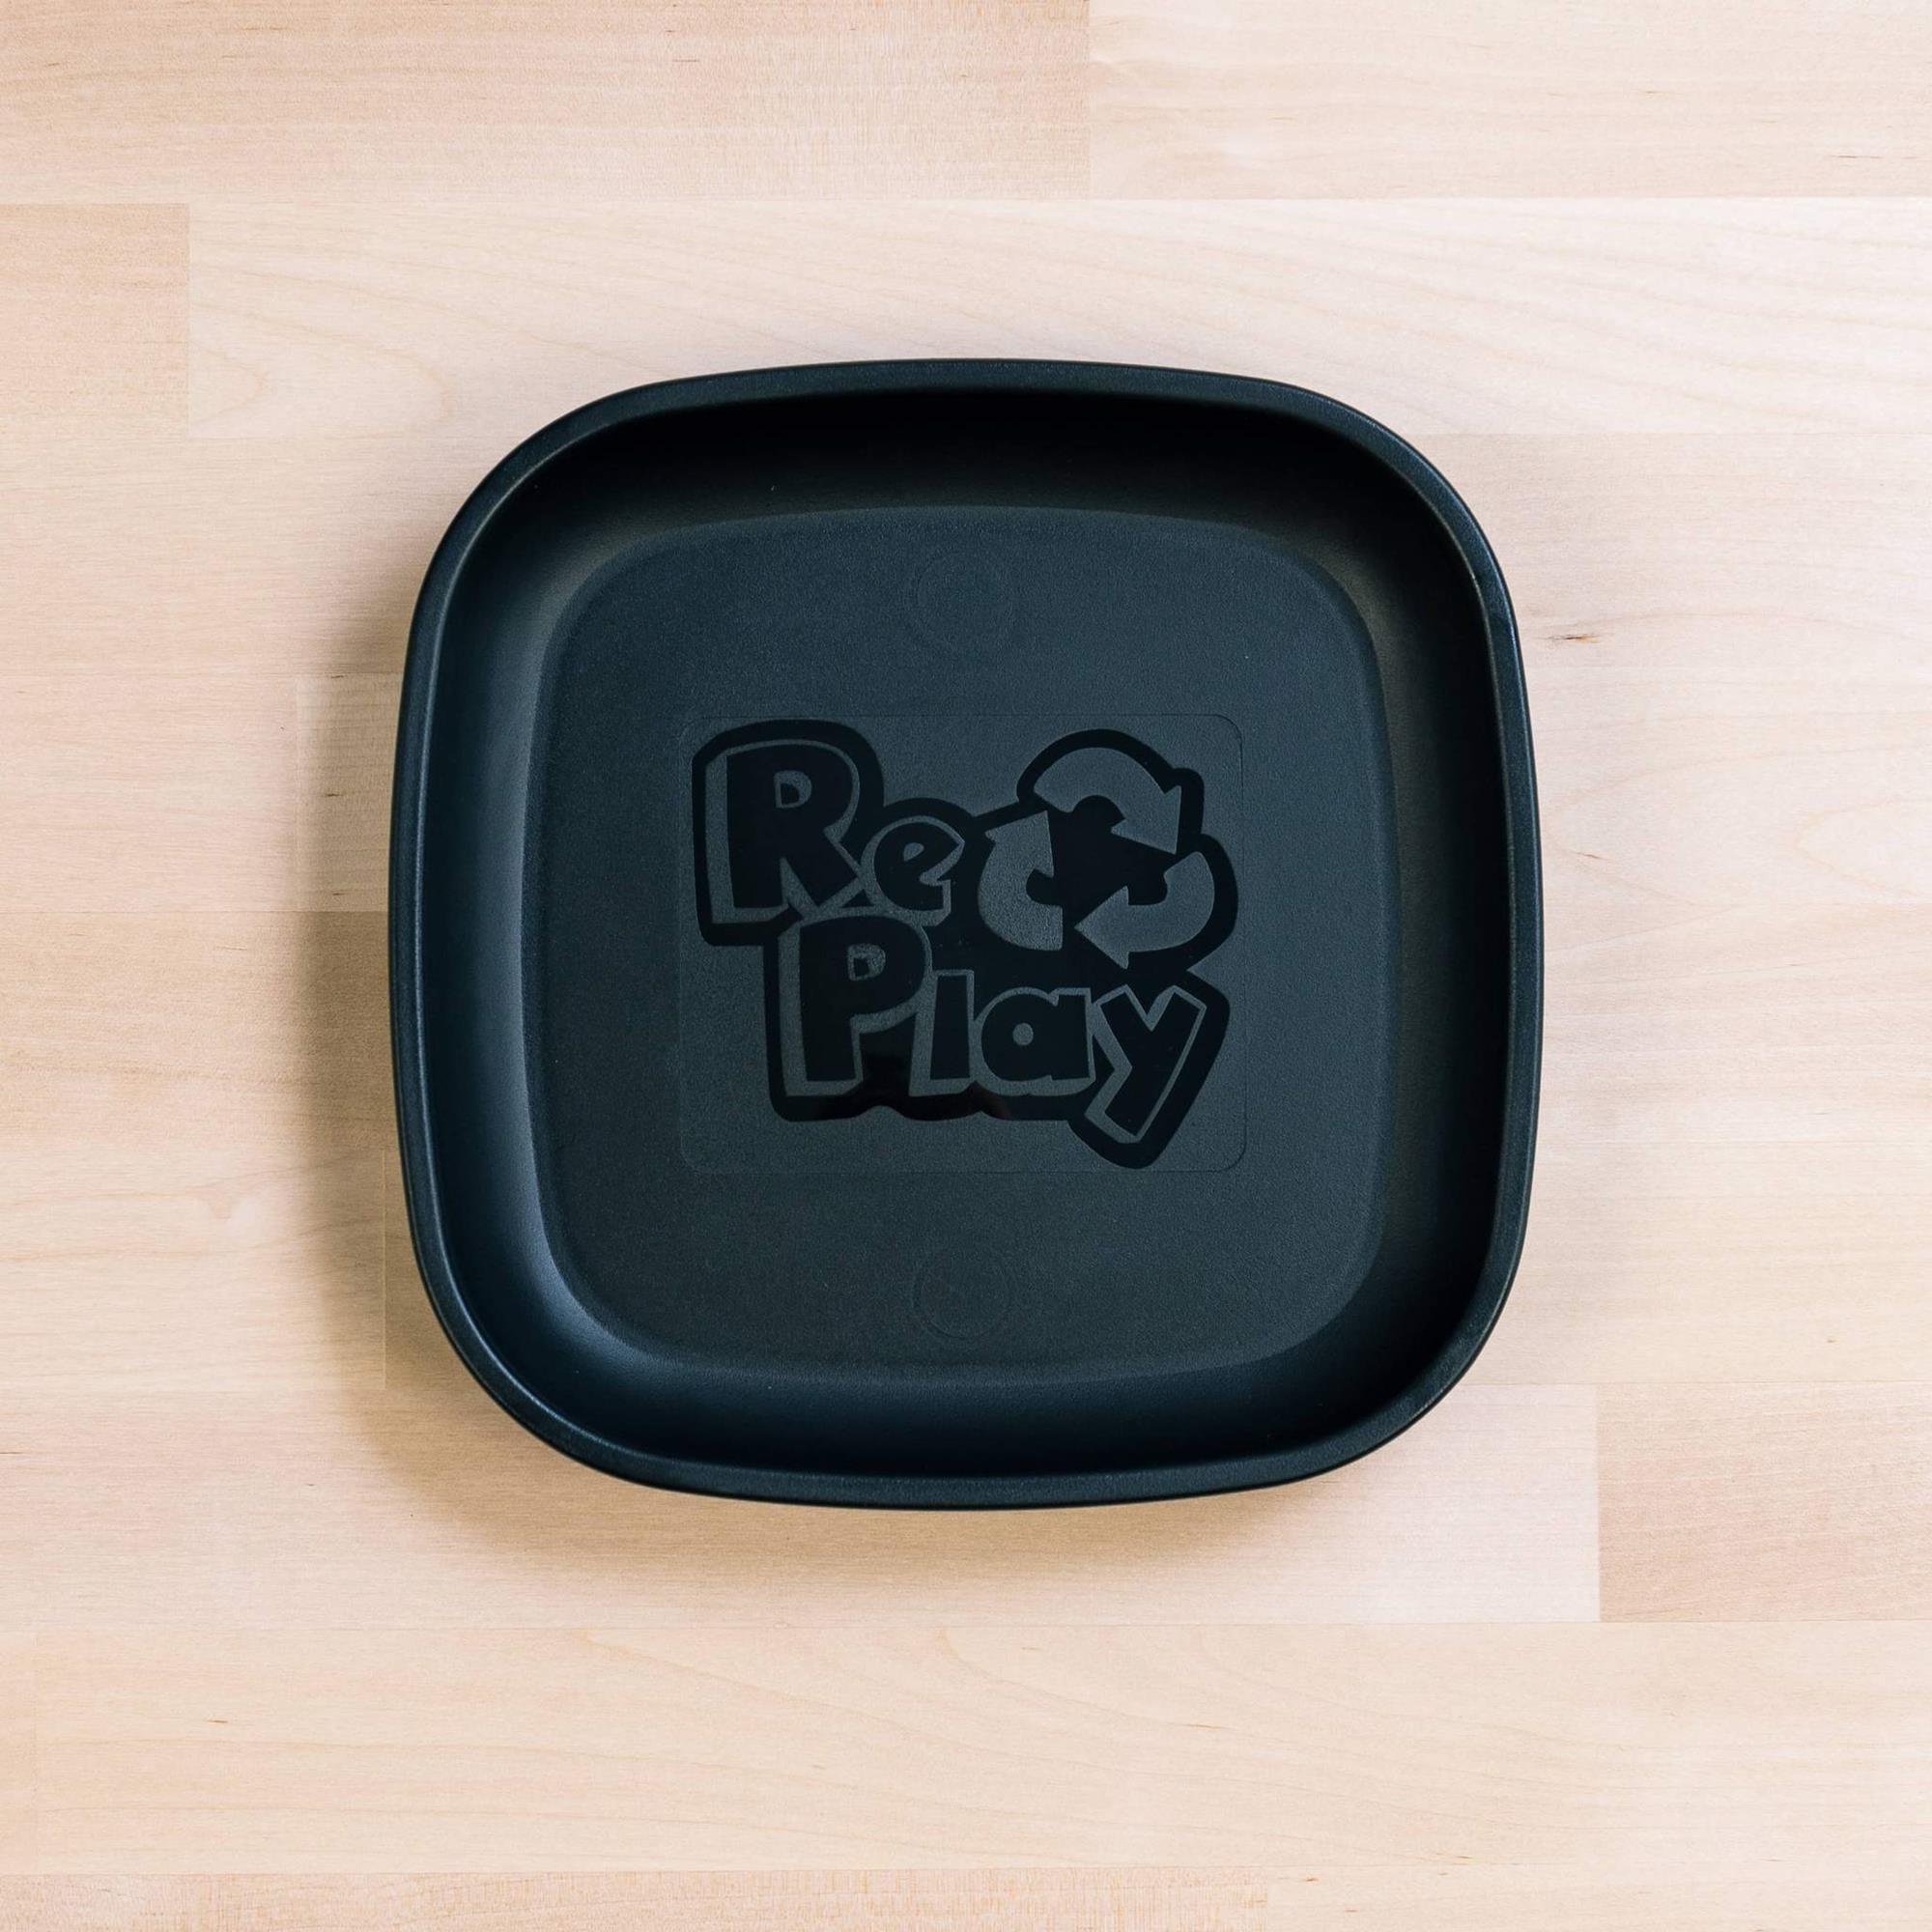 Re-Play Flat Plate - Black